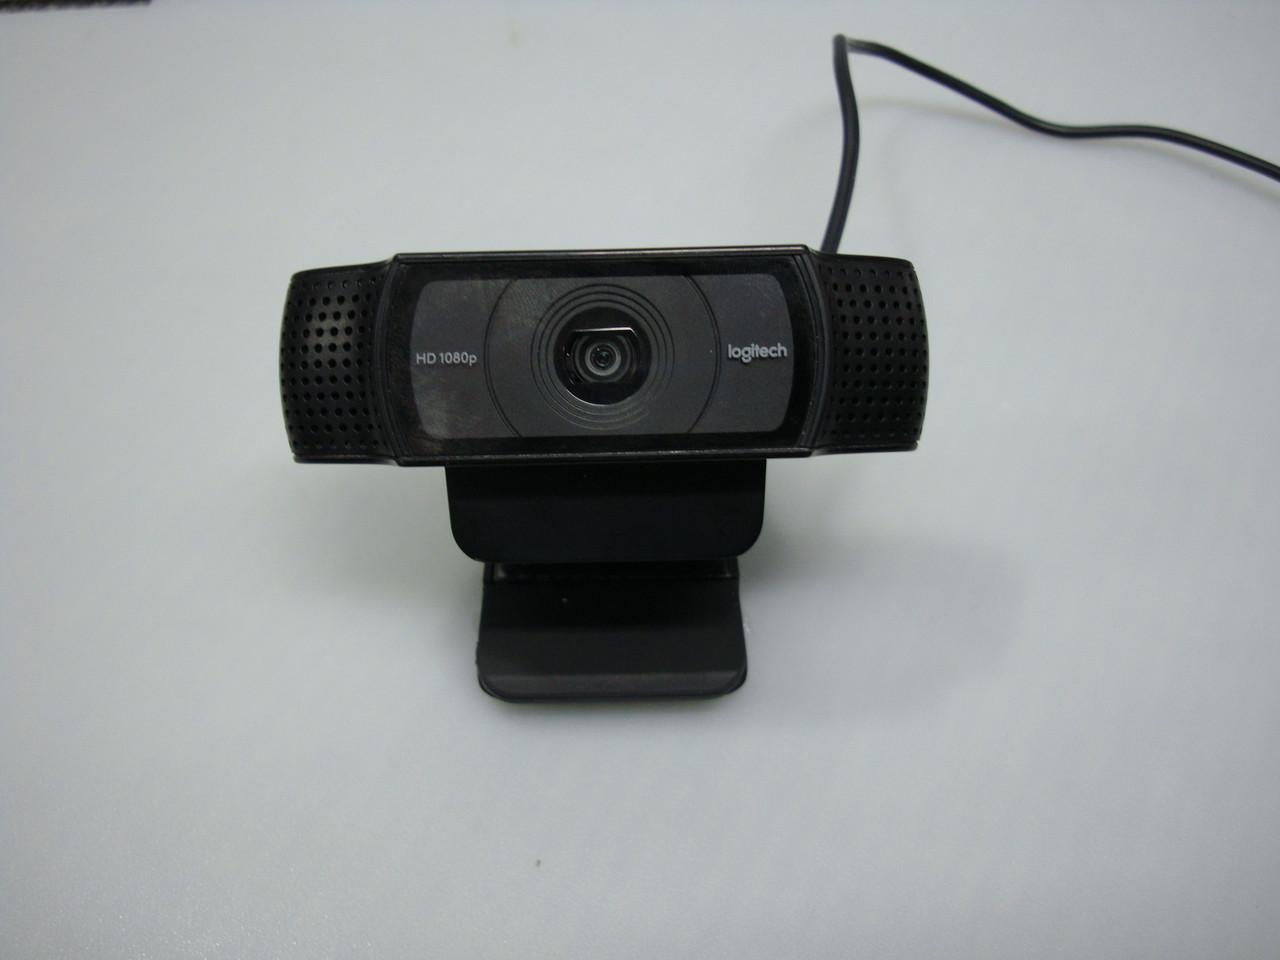 Веб-камера Logitech Webcam HD Pro C920 FullHD (1920x1080) с частотой 30 кадров/сек